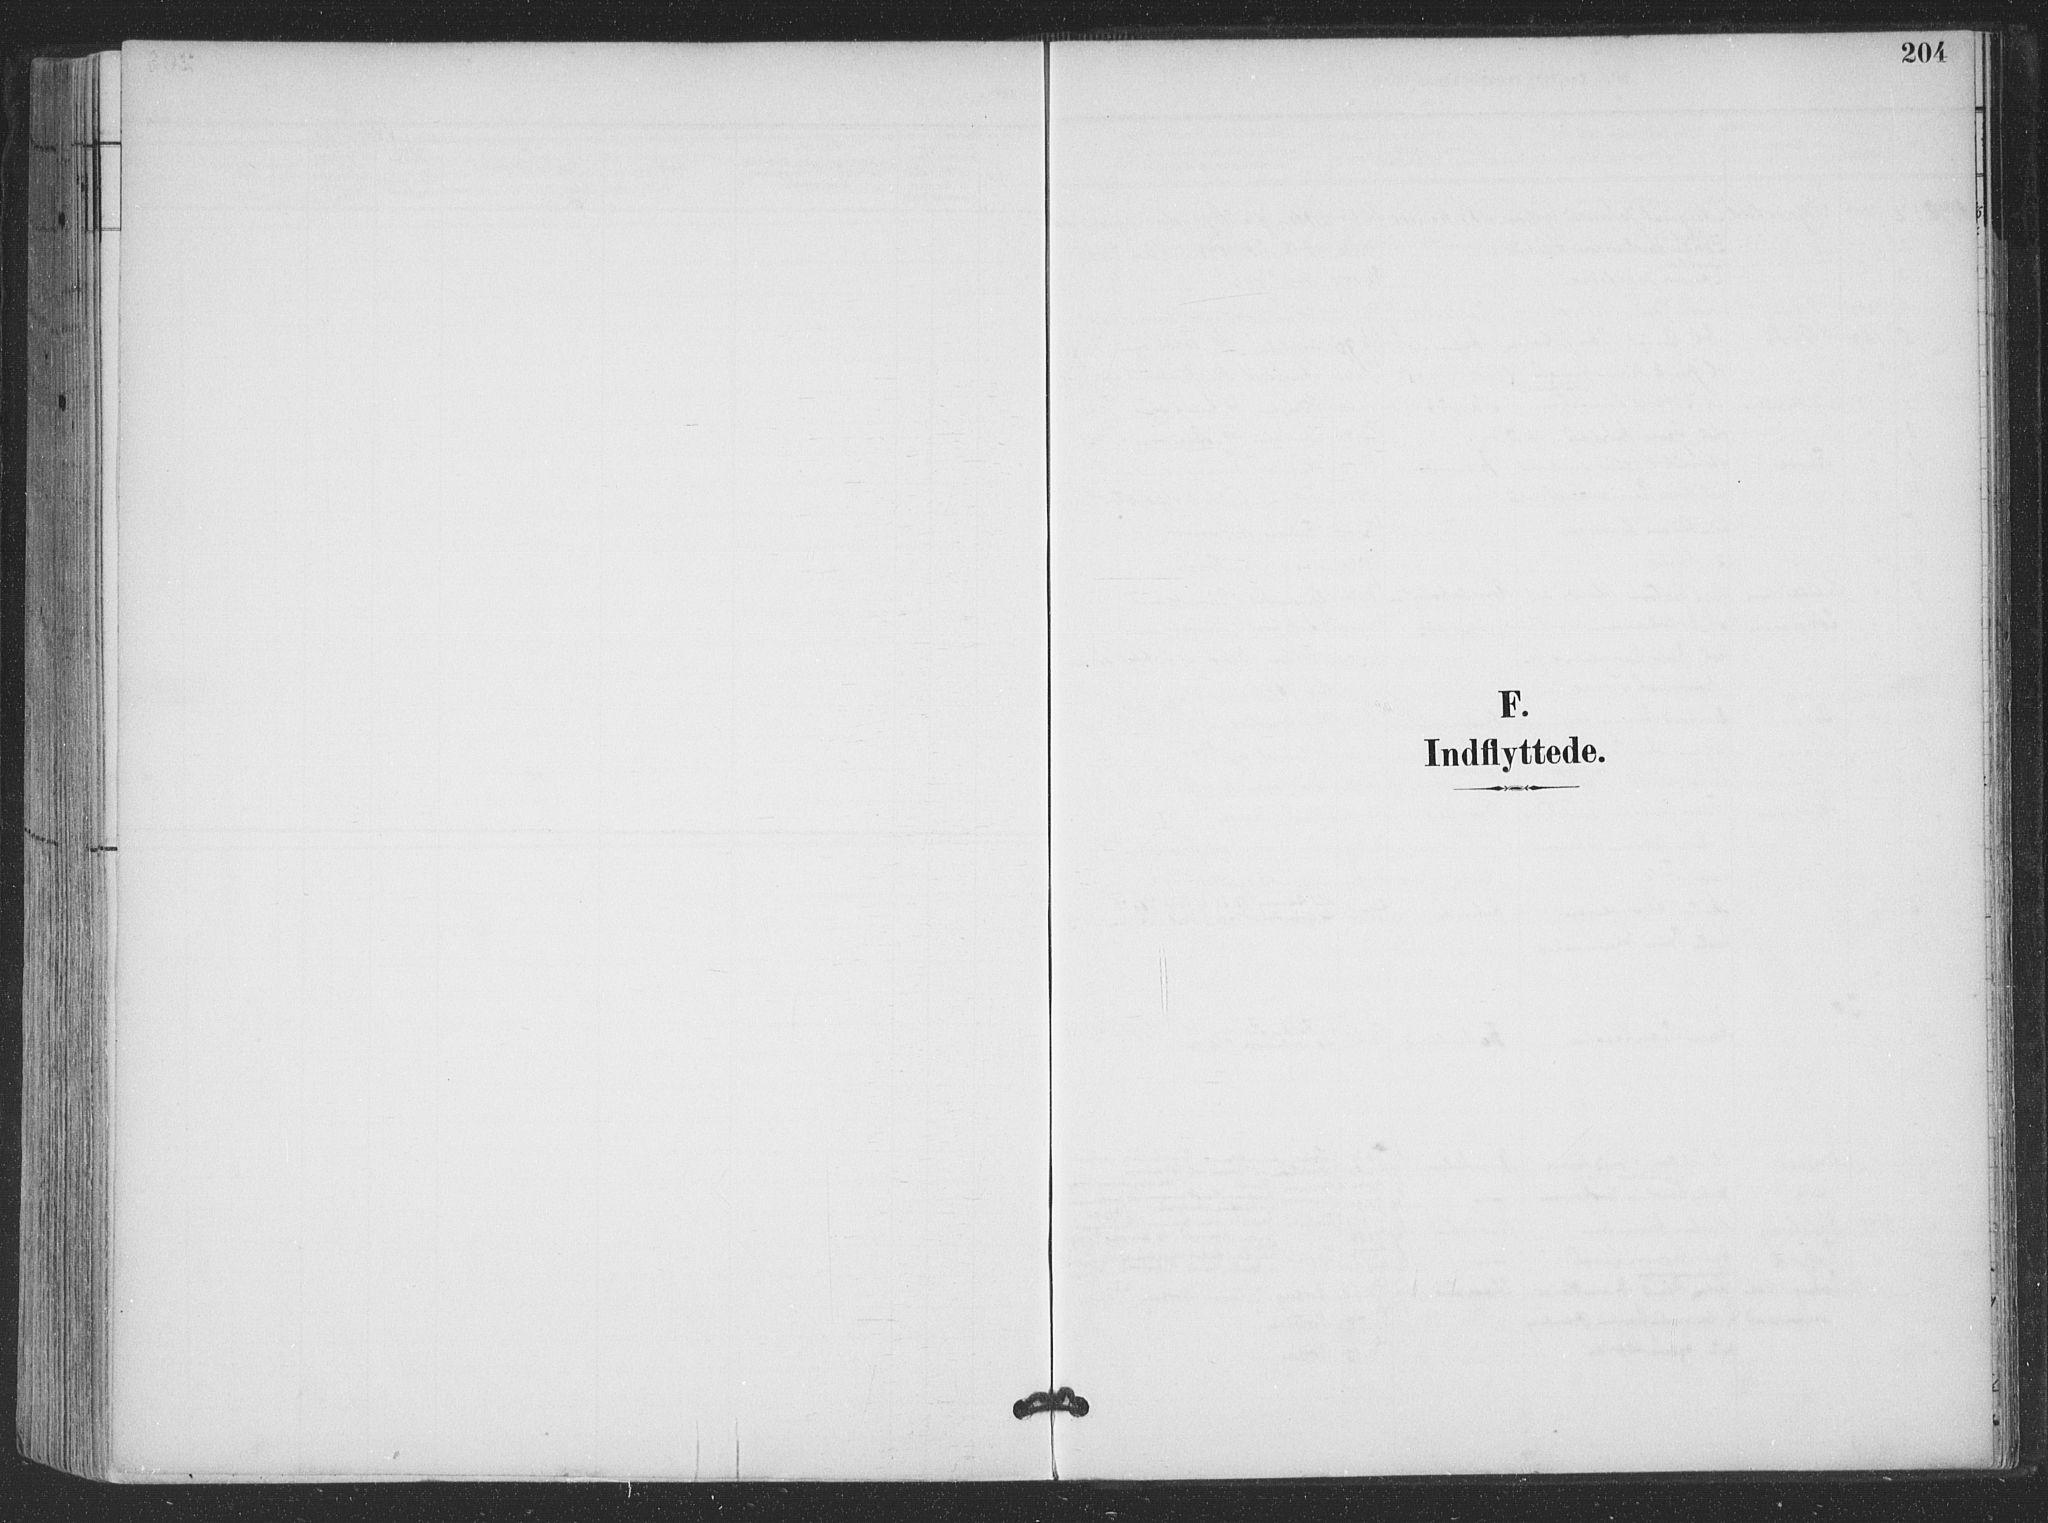 SAT, Ministerialprotokoller, klokkerbøker og fødselsregistre - Nordland, 866/L0939: Ministerialbok nr. 866A02, 1894-1906, s. 204